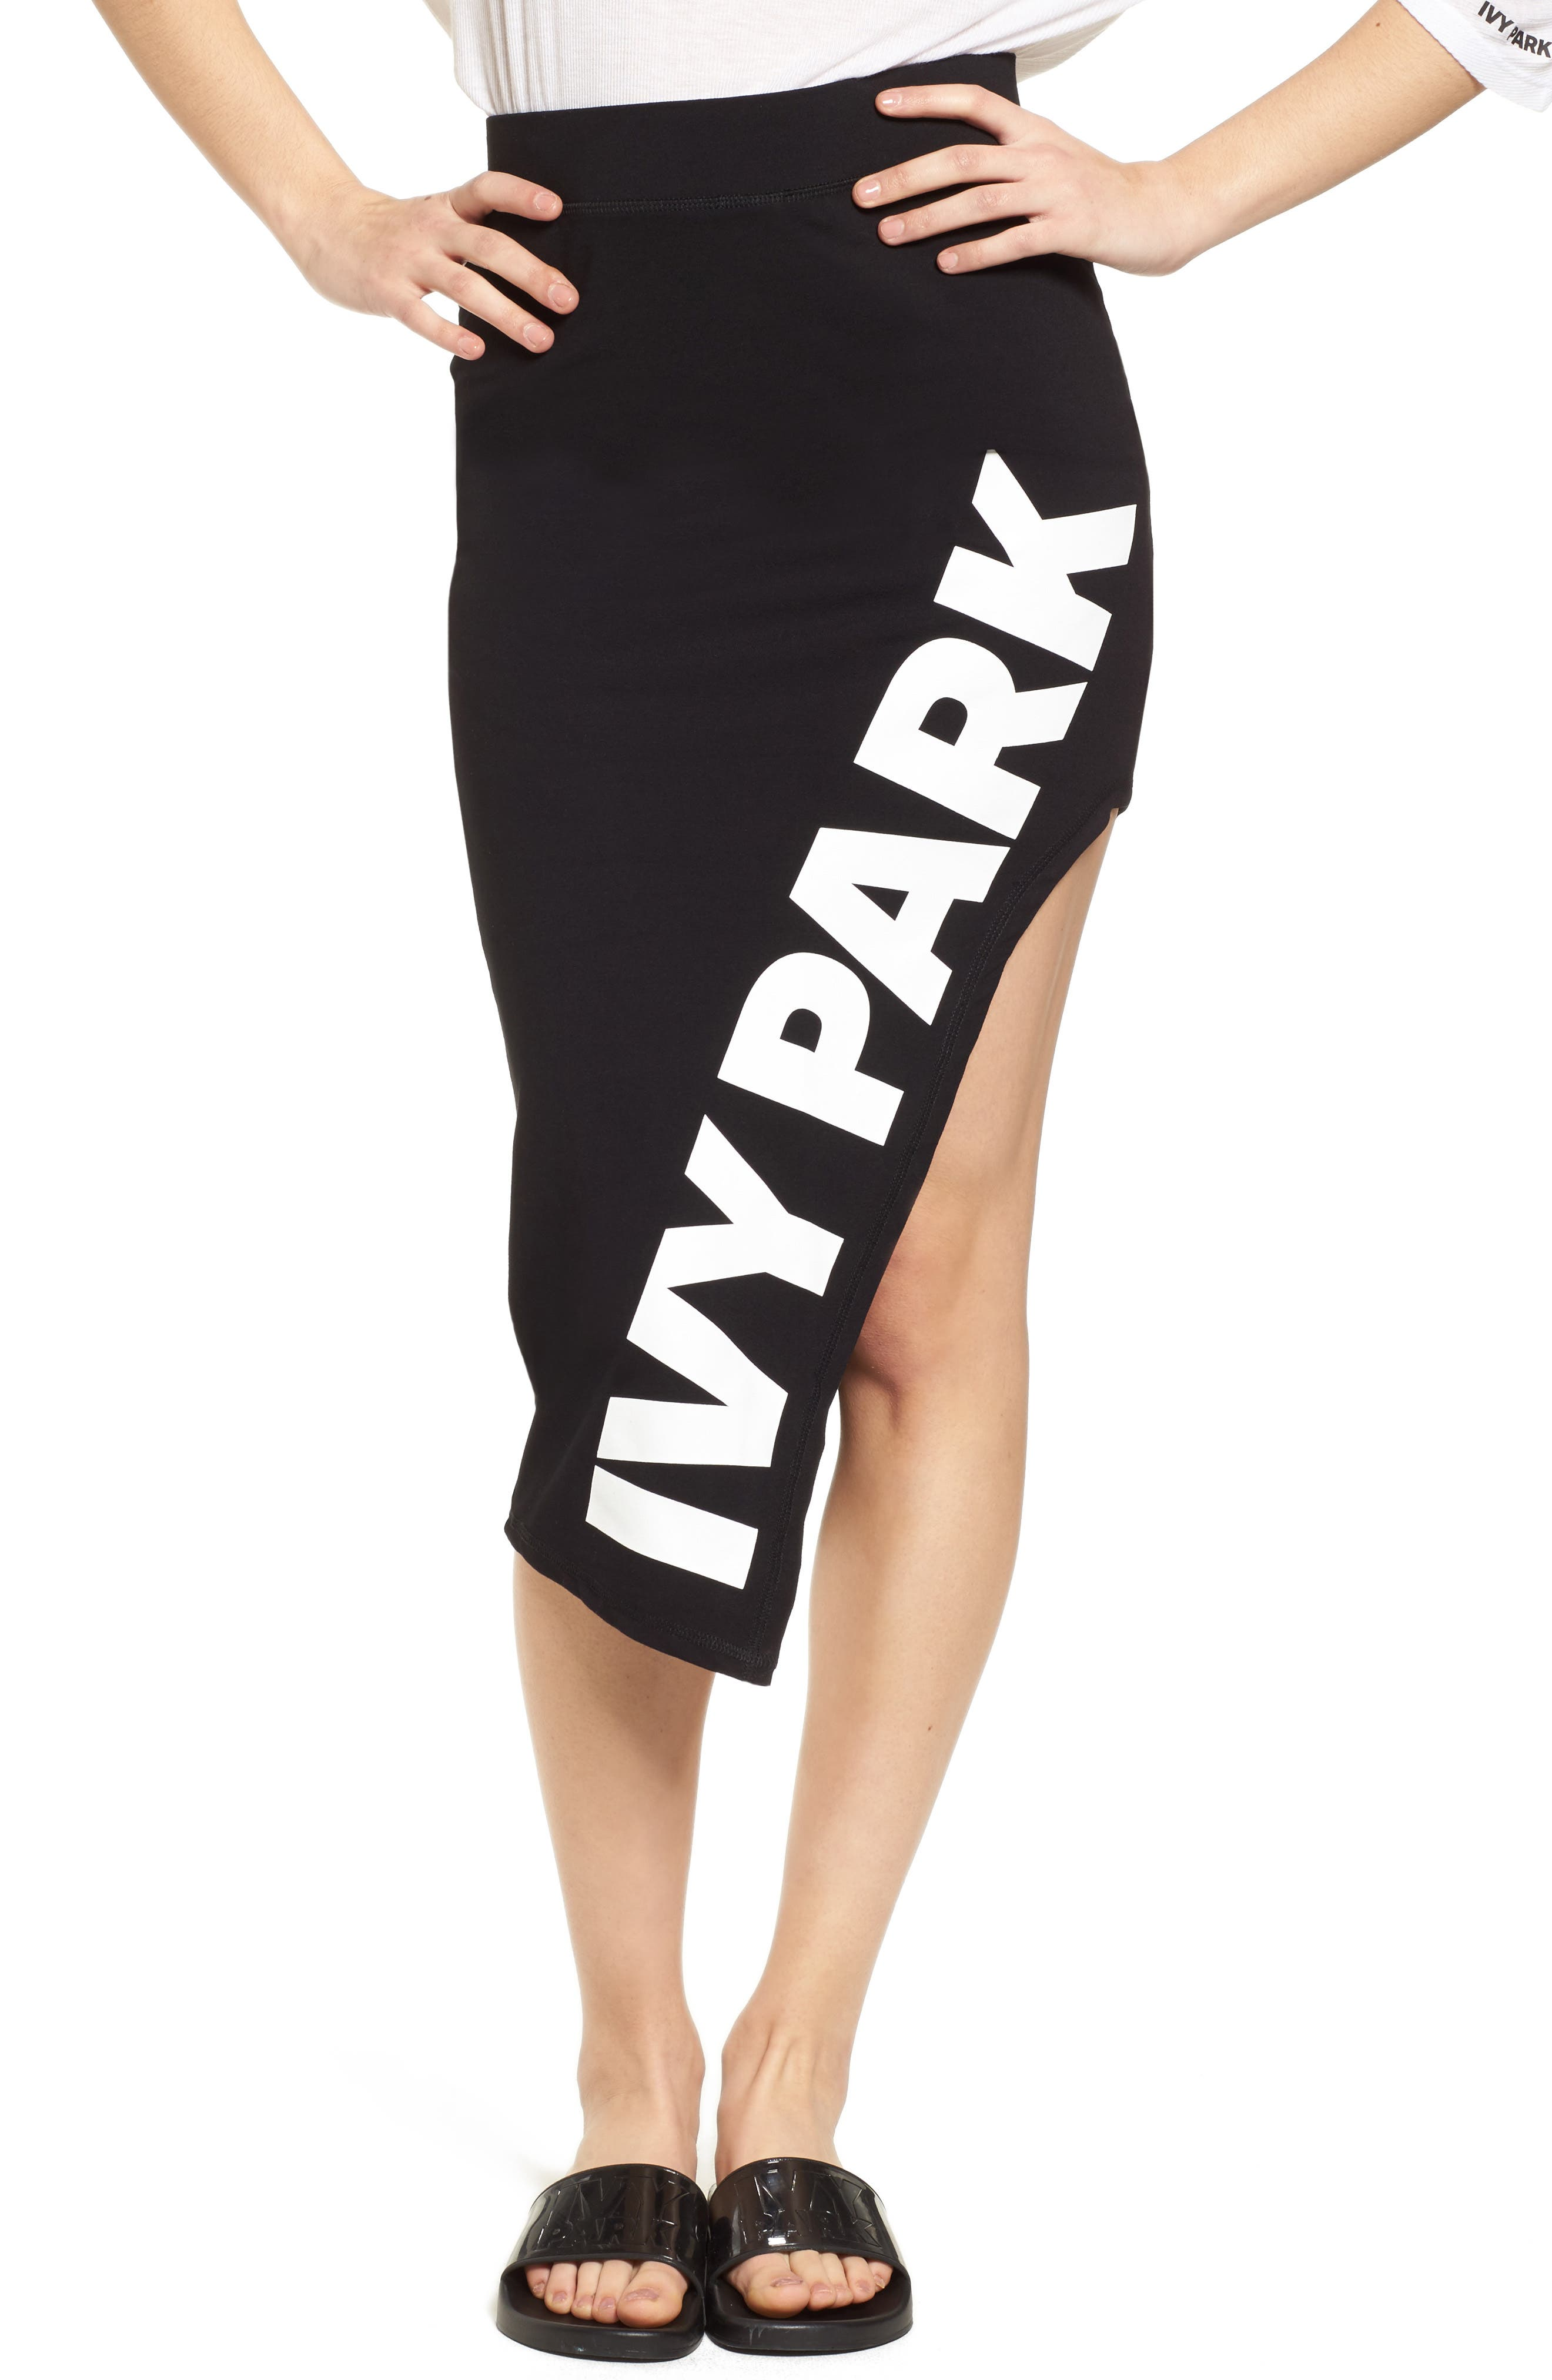 Alternate Image 1 Selected - IVY PARK® Logo Cutaway Side Pencil Skirt